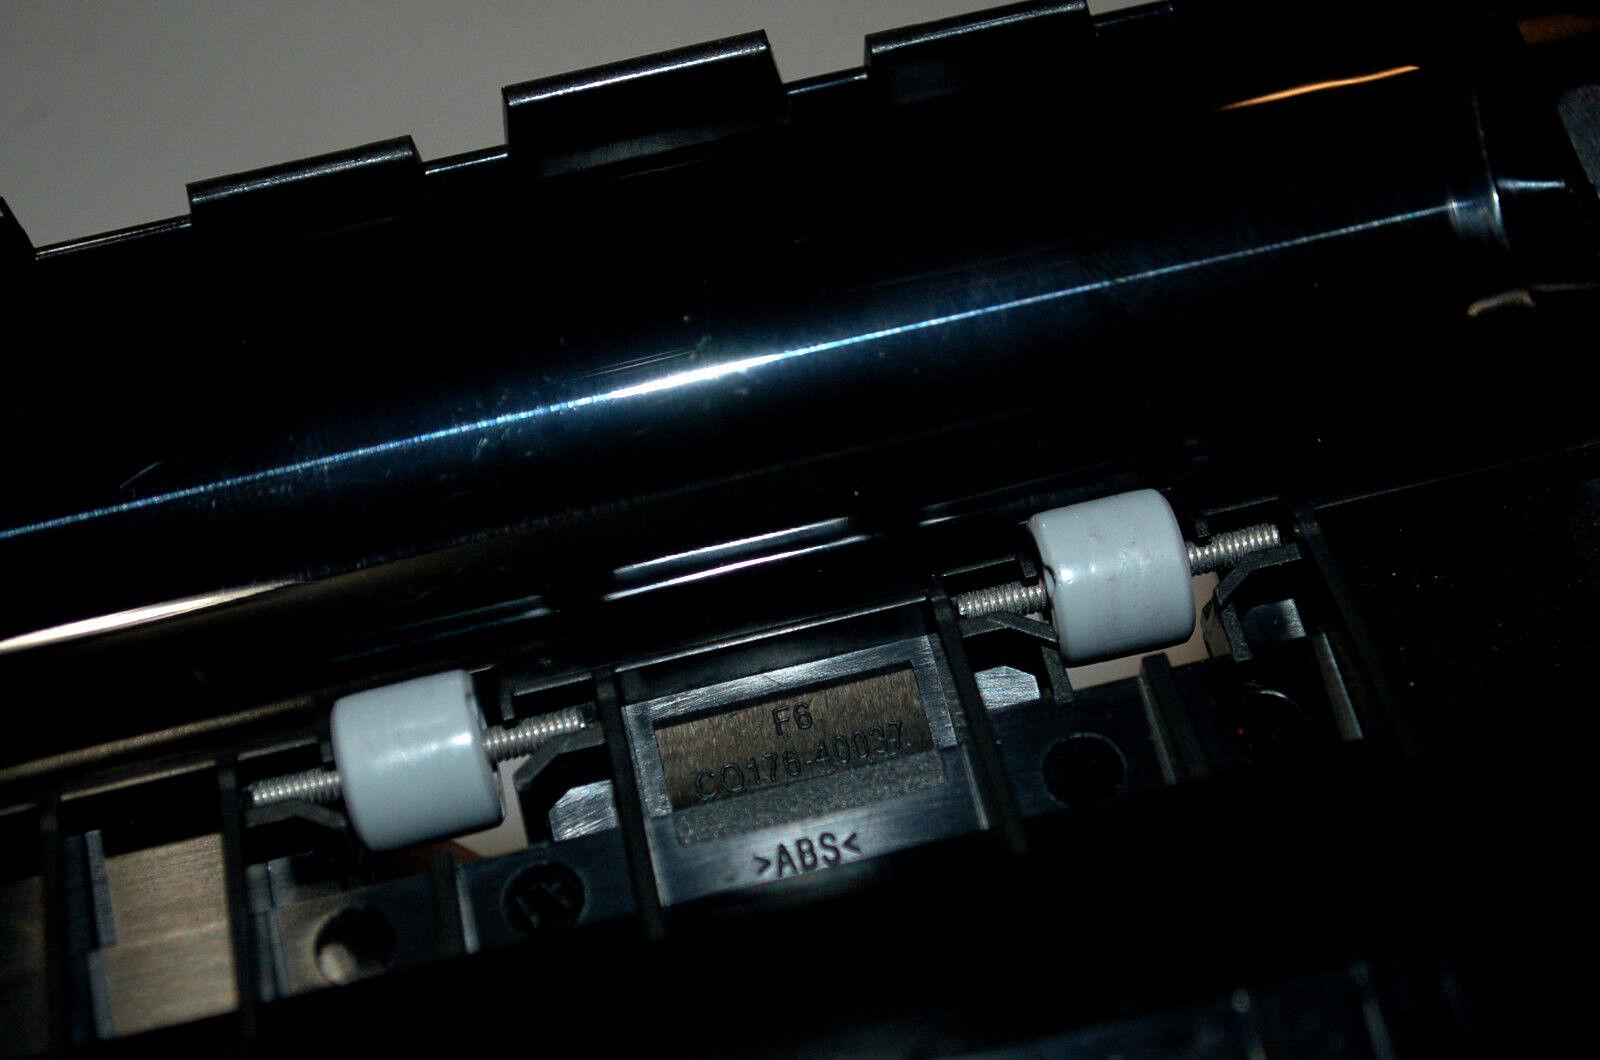 Genuine HP CQ176-40037 Paper Cleanout Assembly Path Jam Access Envy 7640 5510